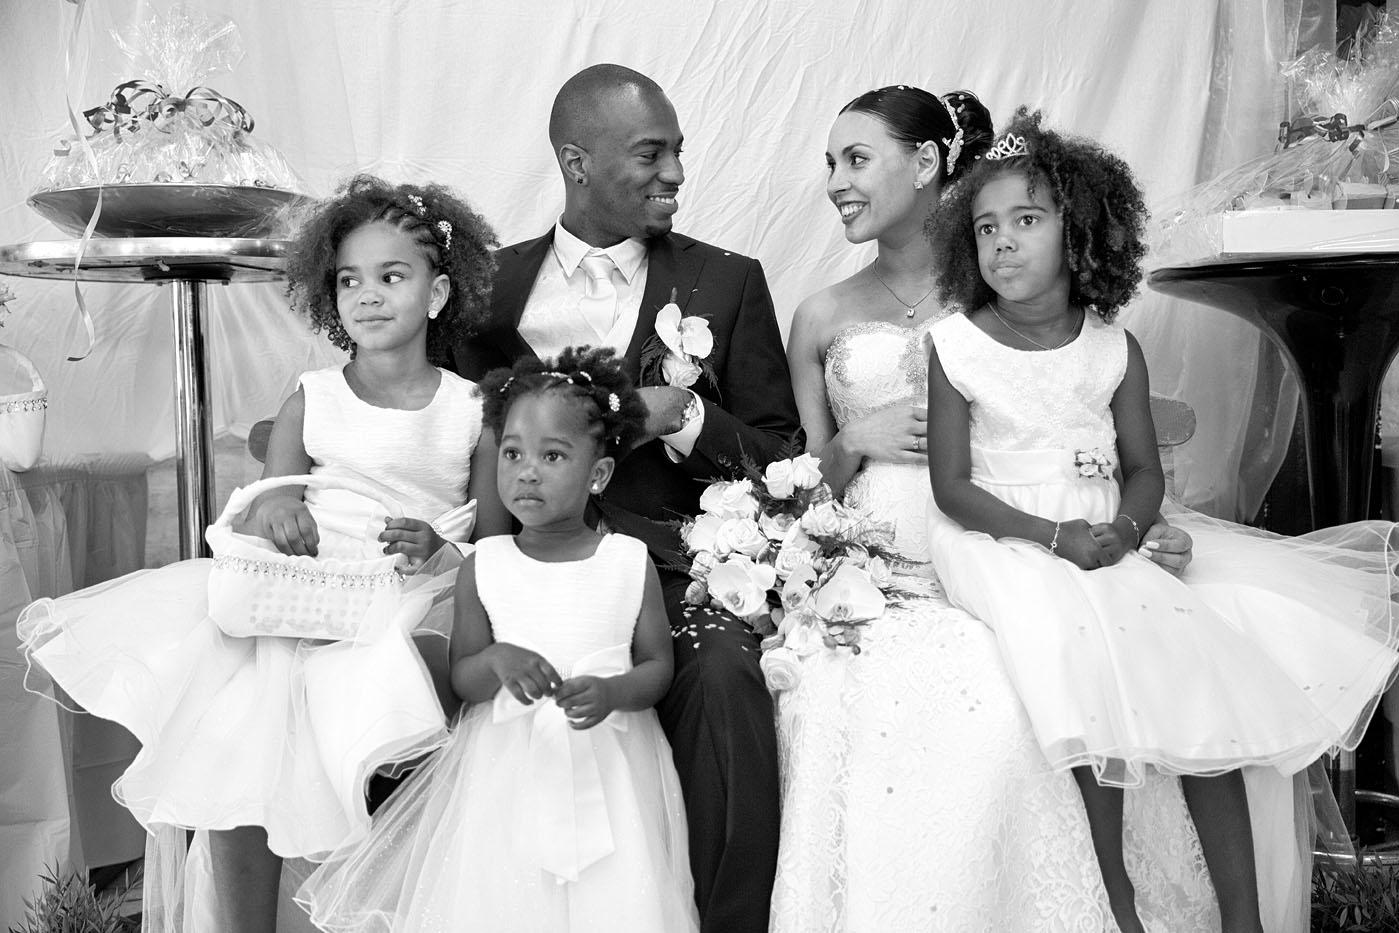 bruiloft-wedding-trouwen-rotterdam-fotograaf-bobhersbach-mooi